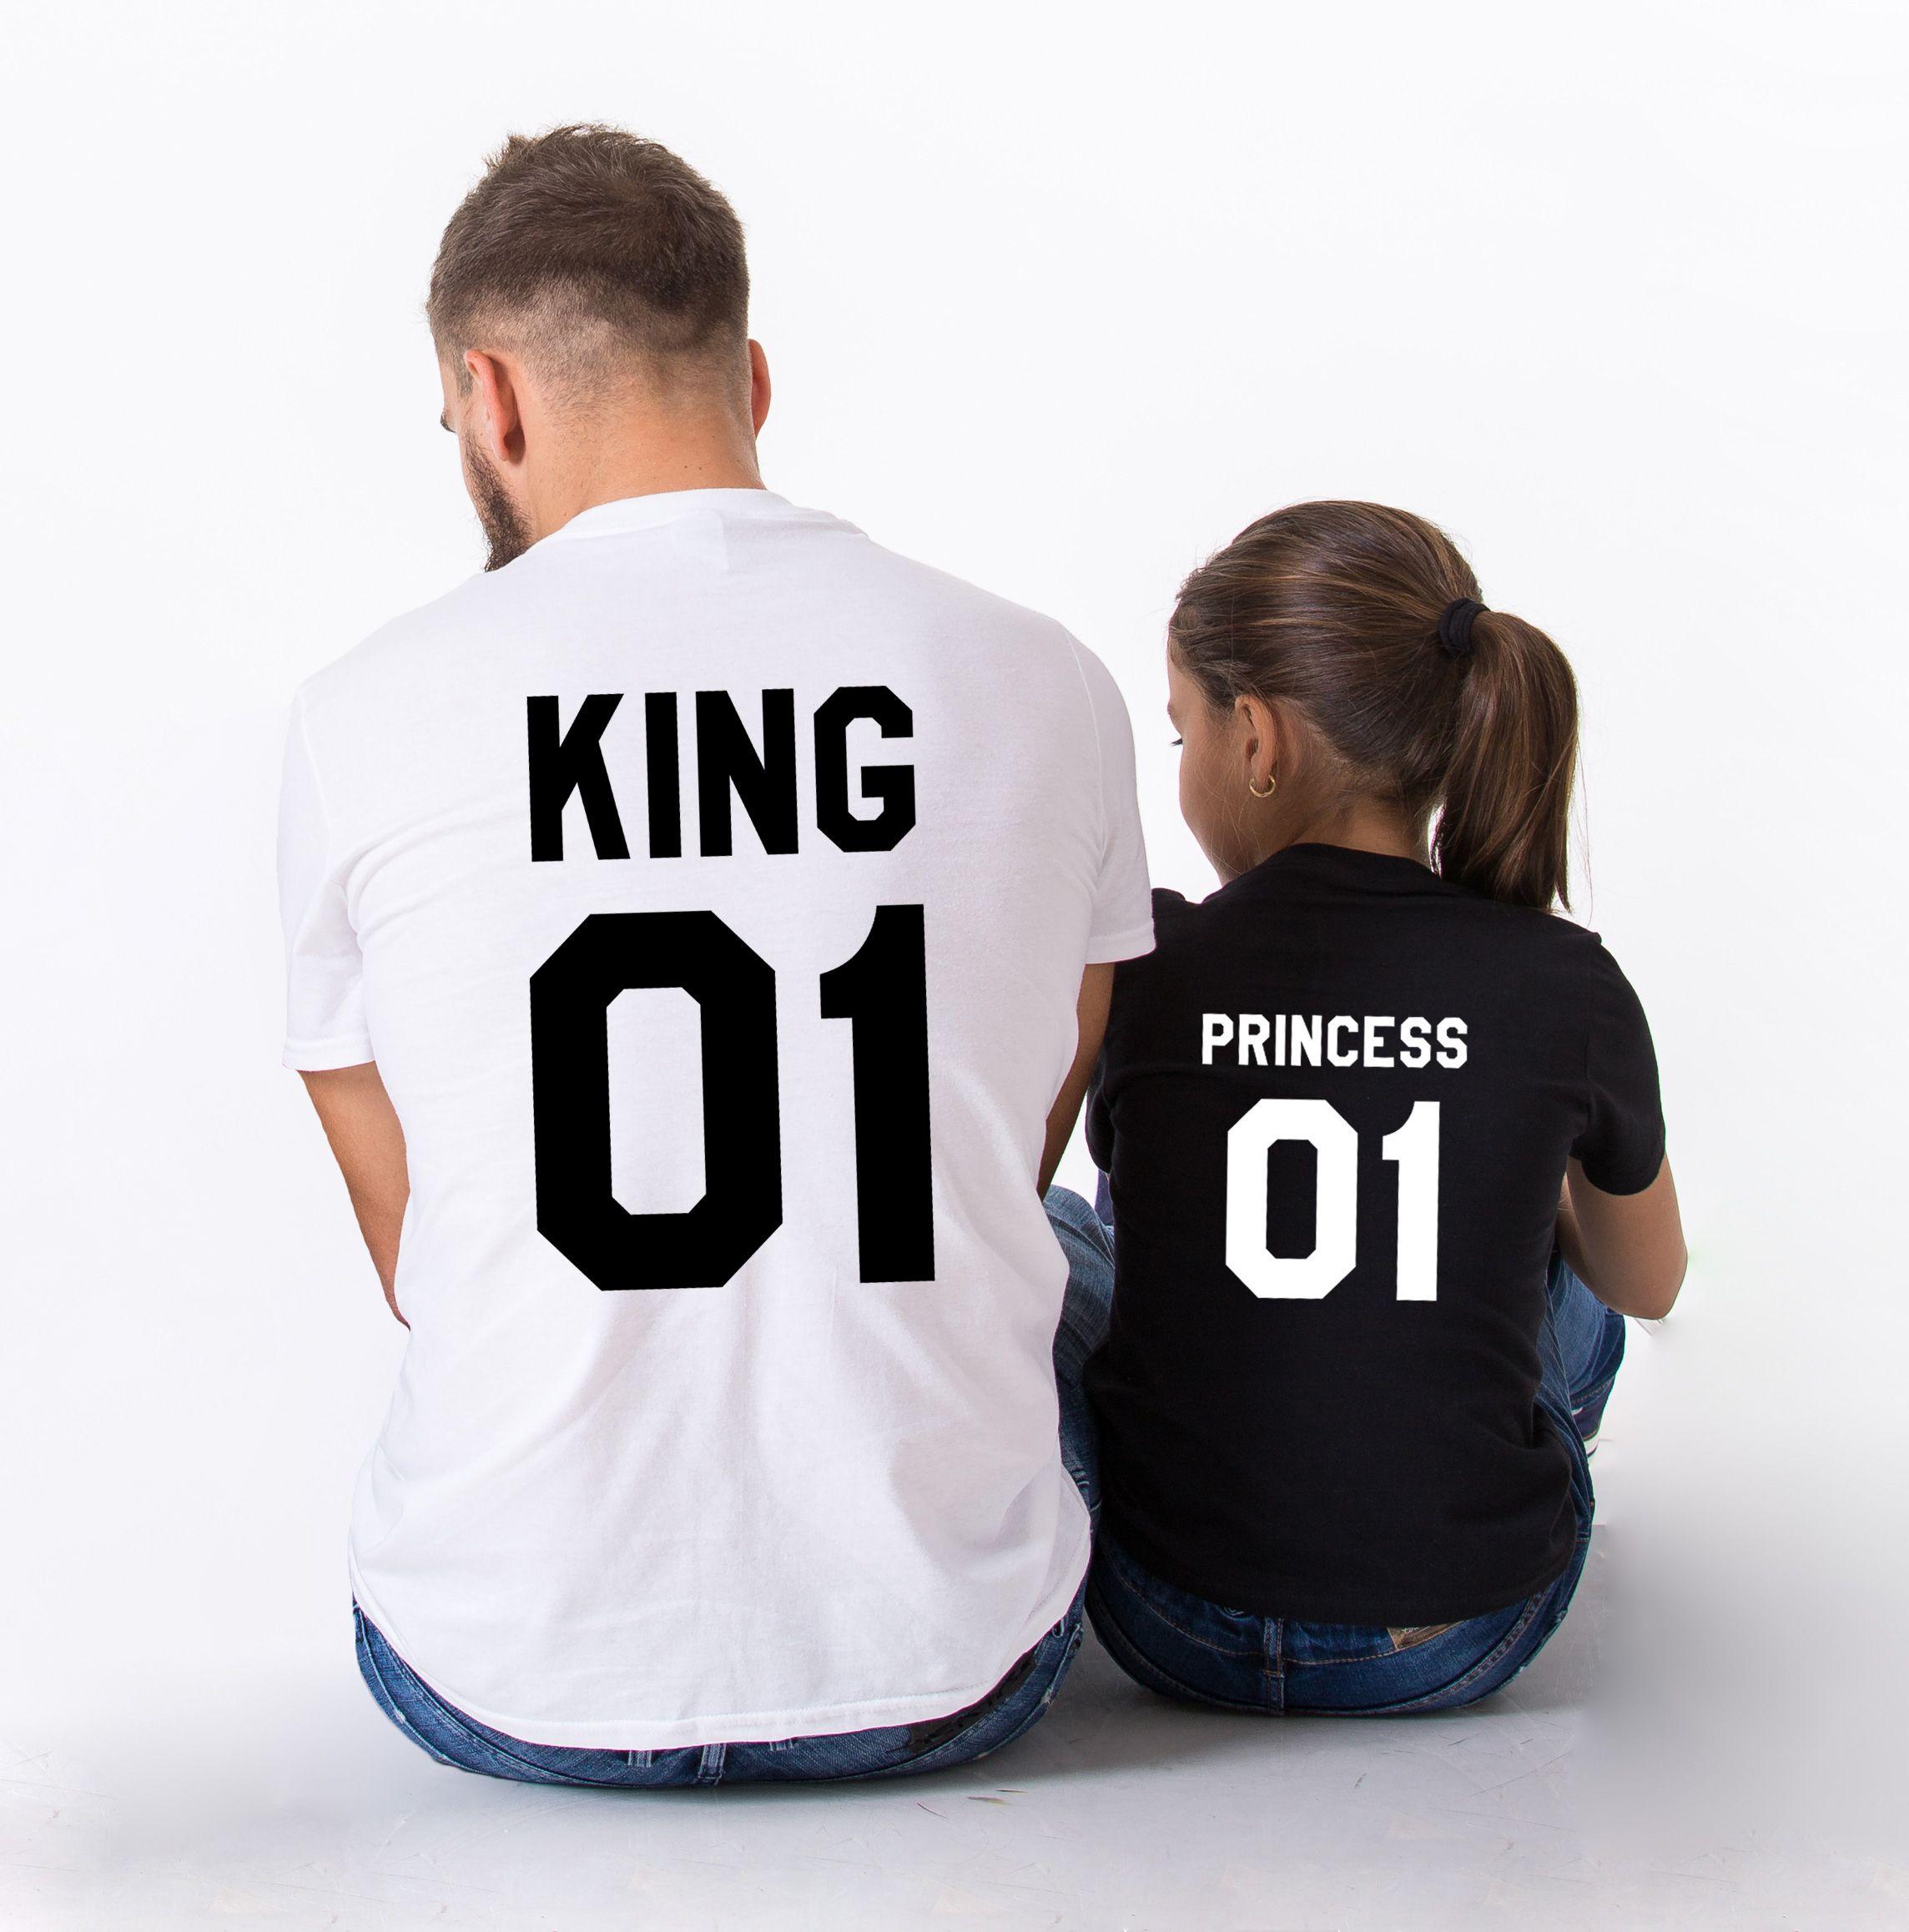 king princess - photo #39